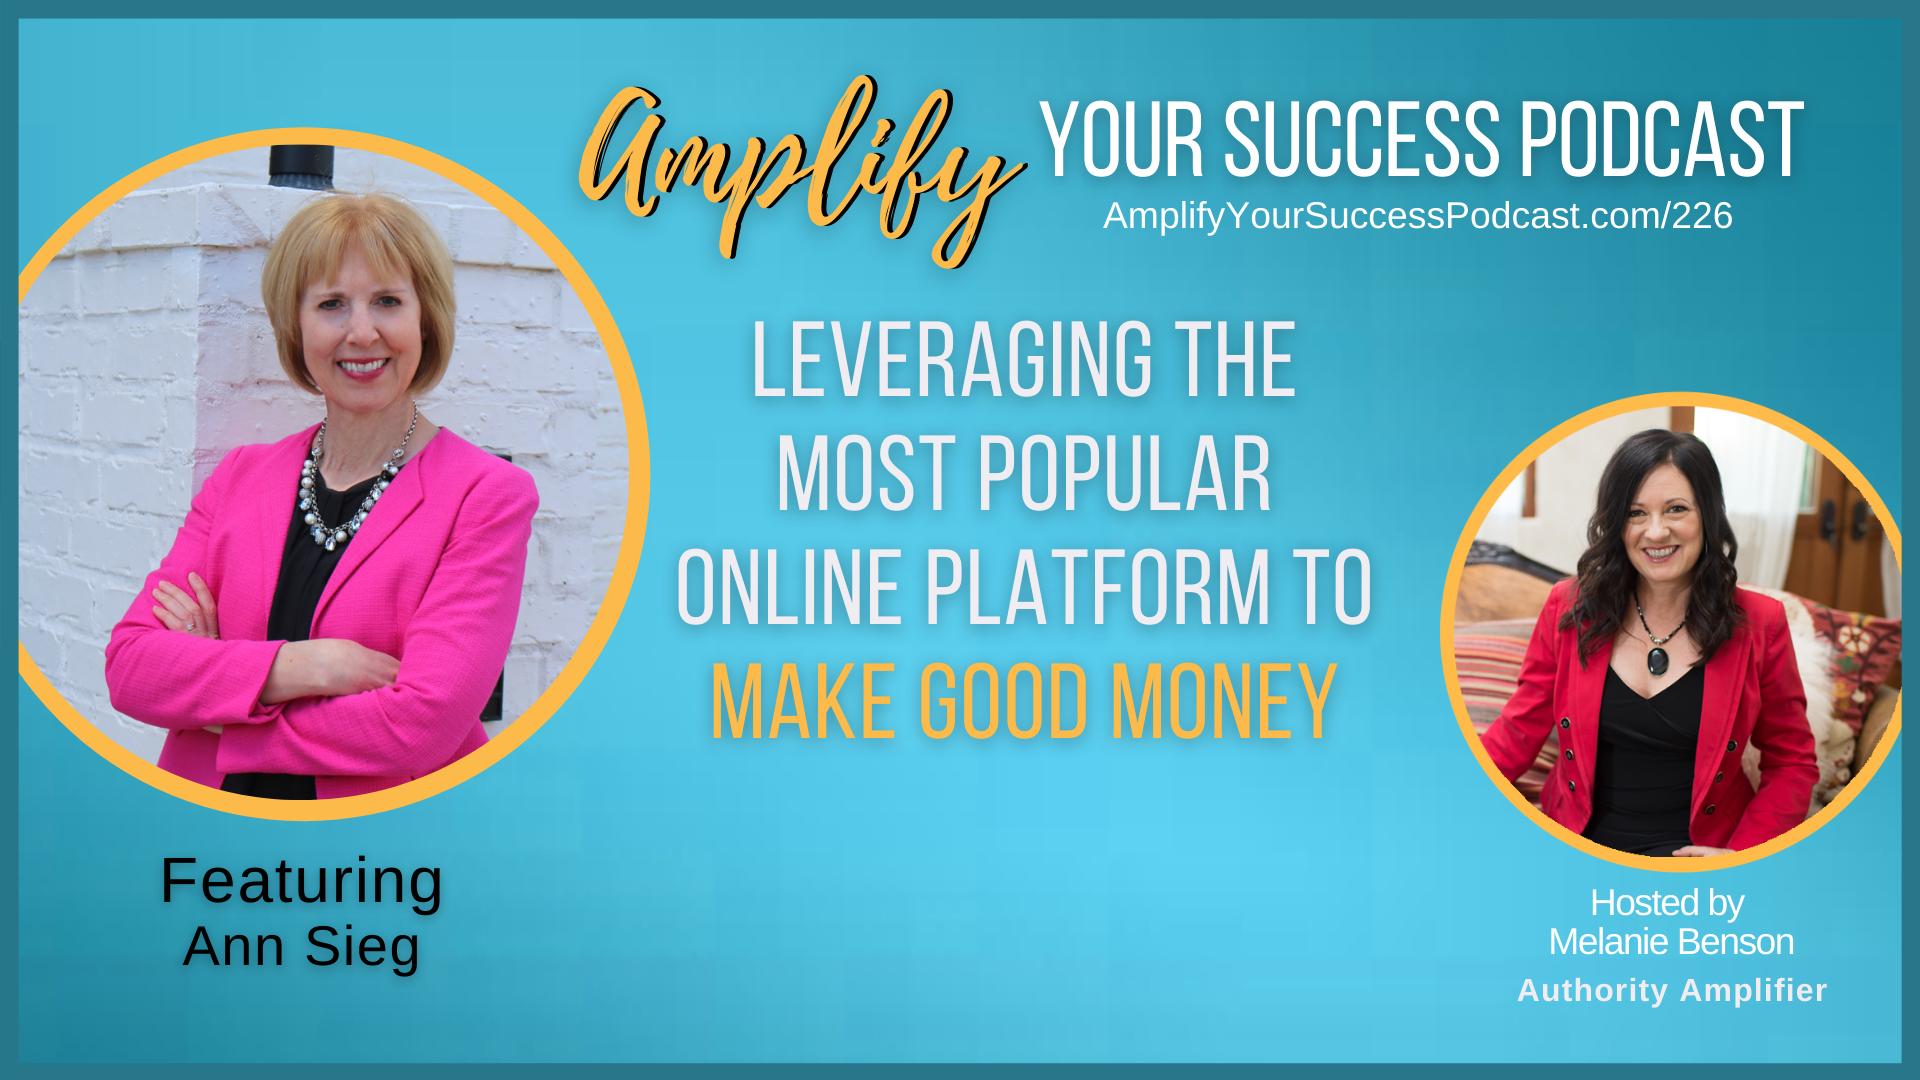 Leveraging the Most-Popular Online Platform to Make GOOD Money with Melanie Benson